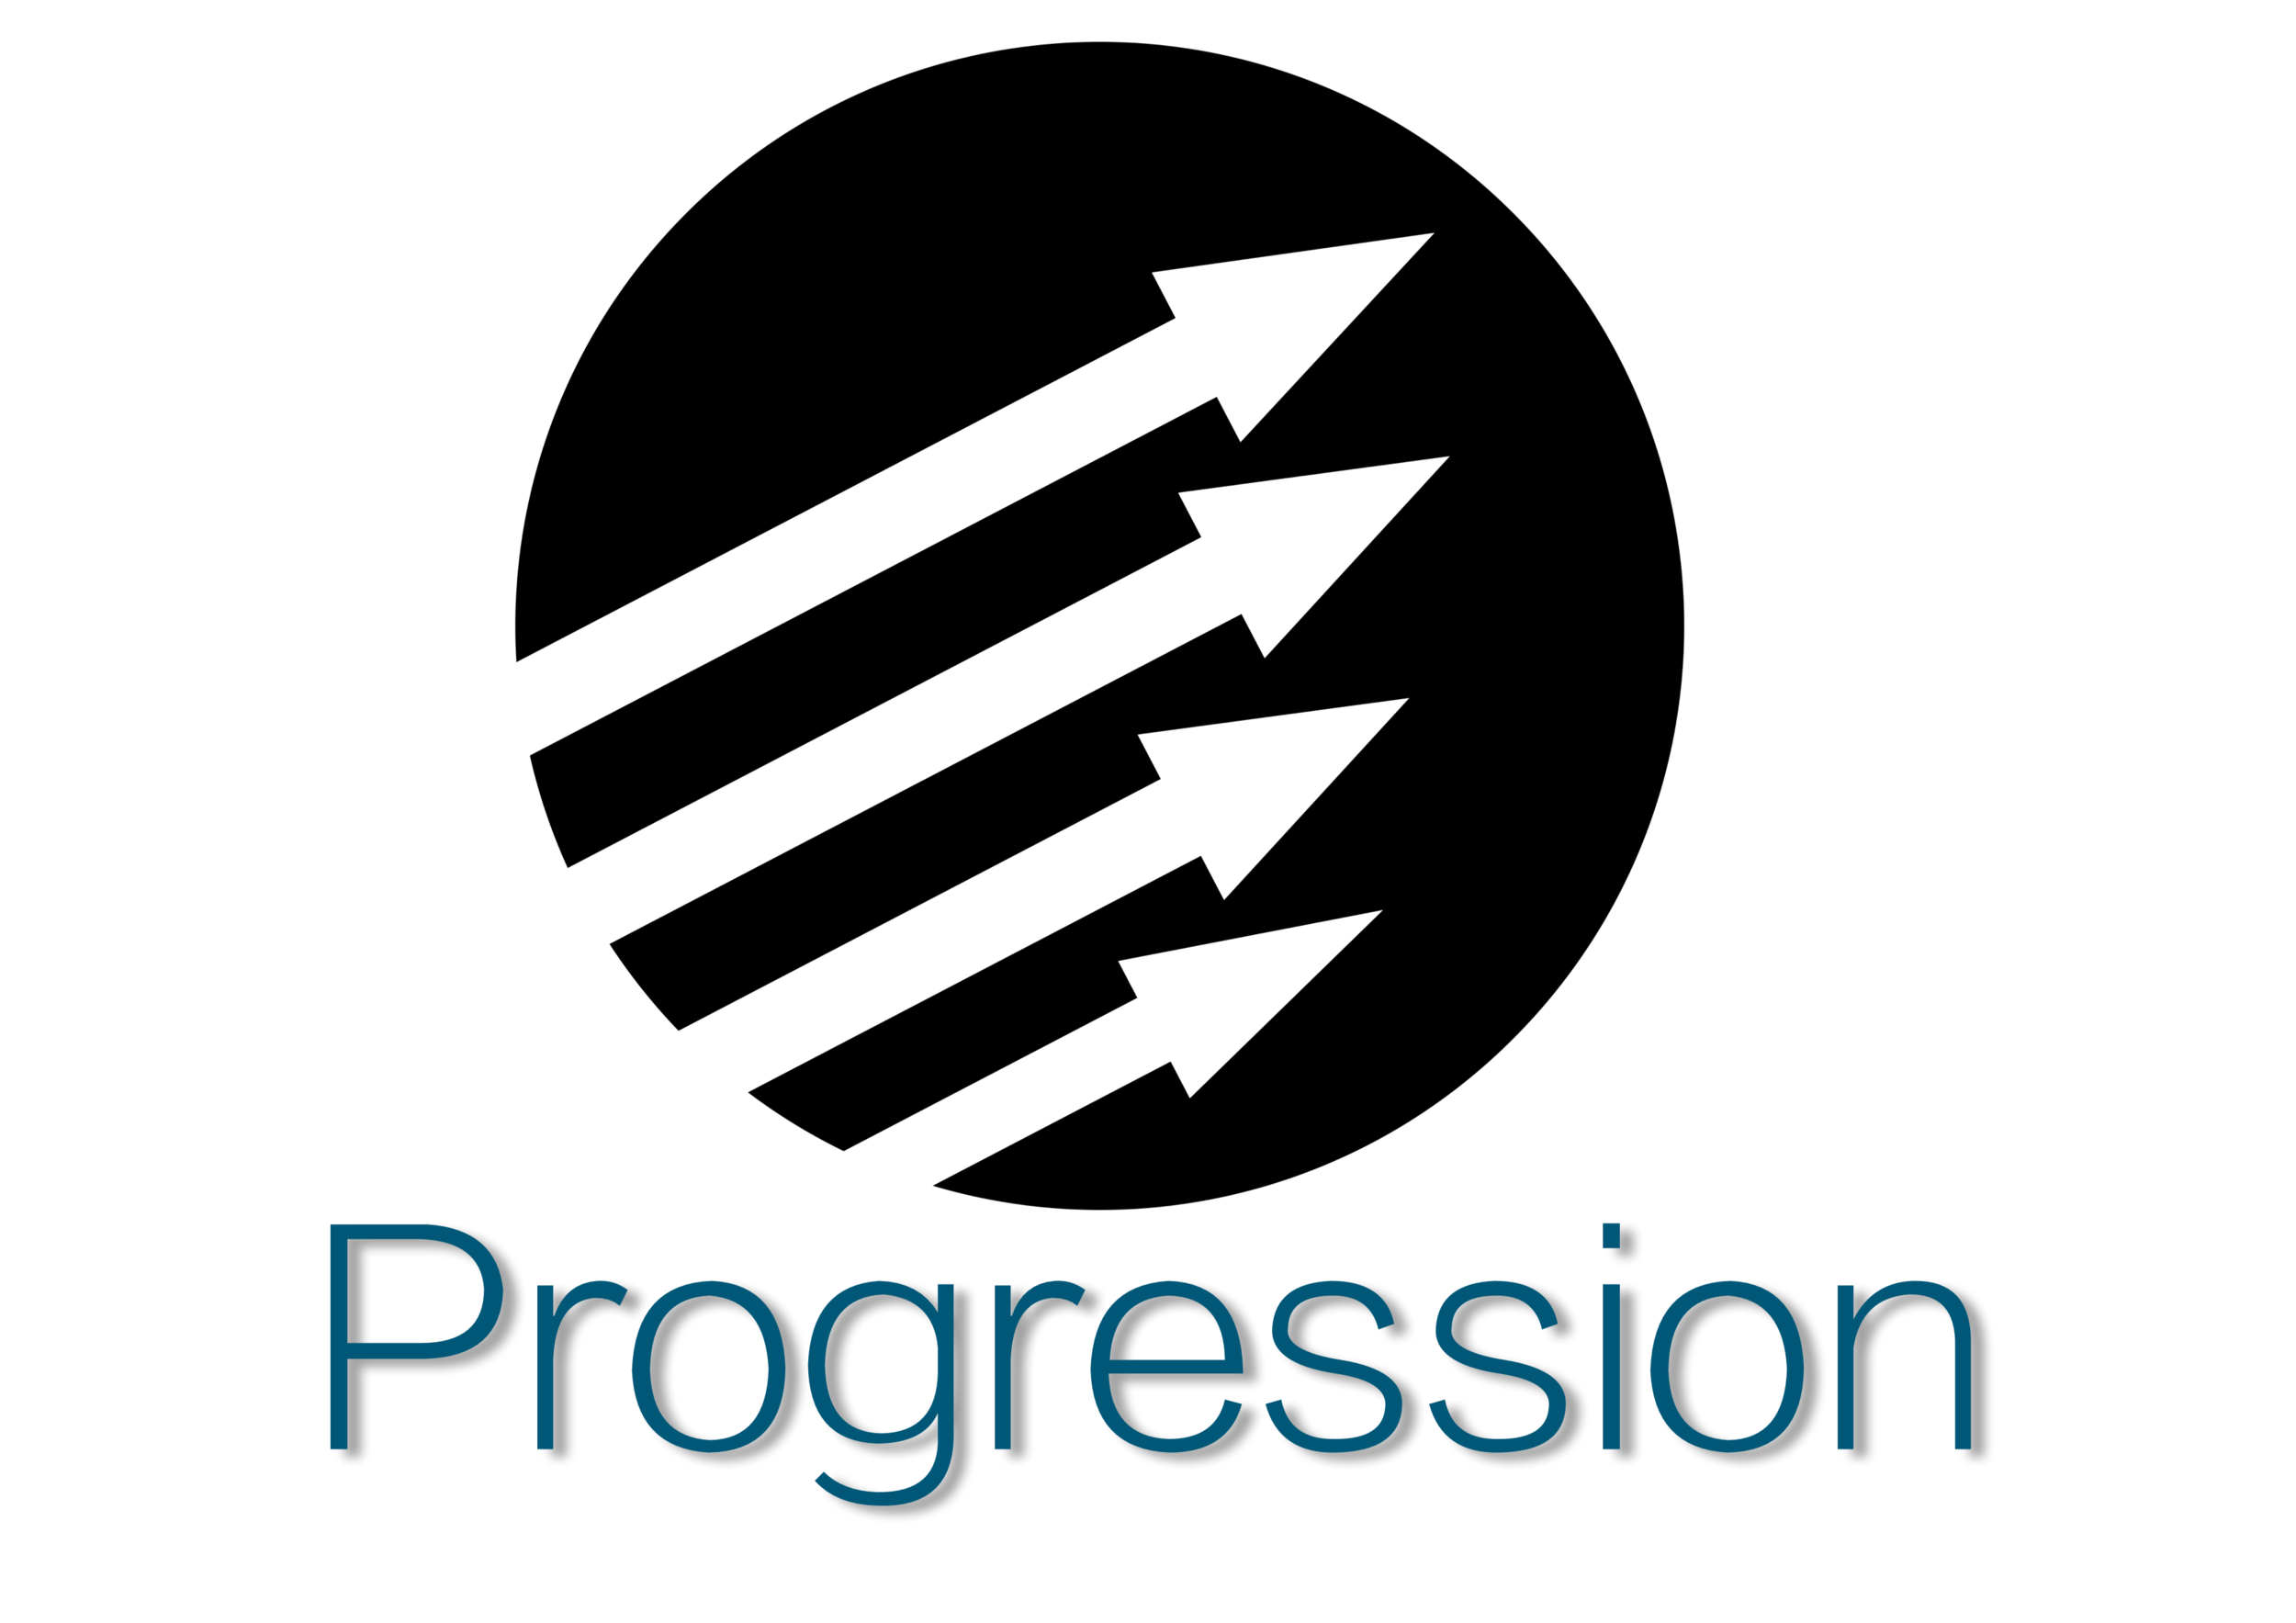 progression full logo.png